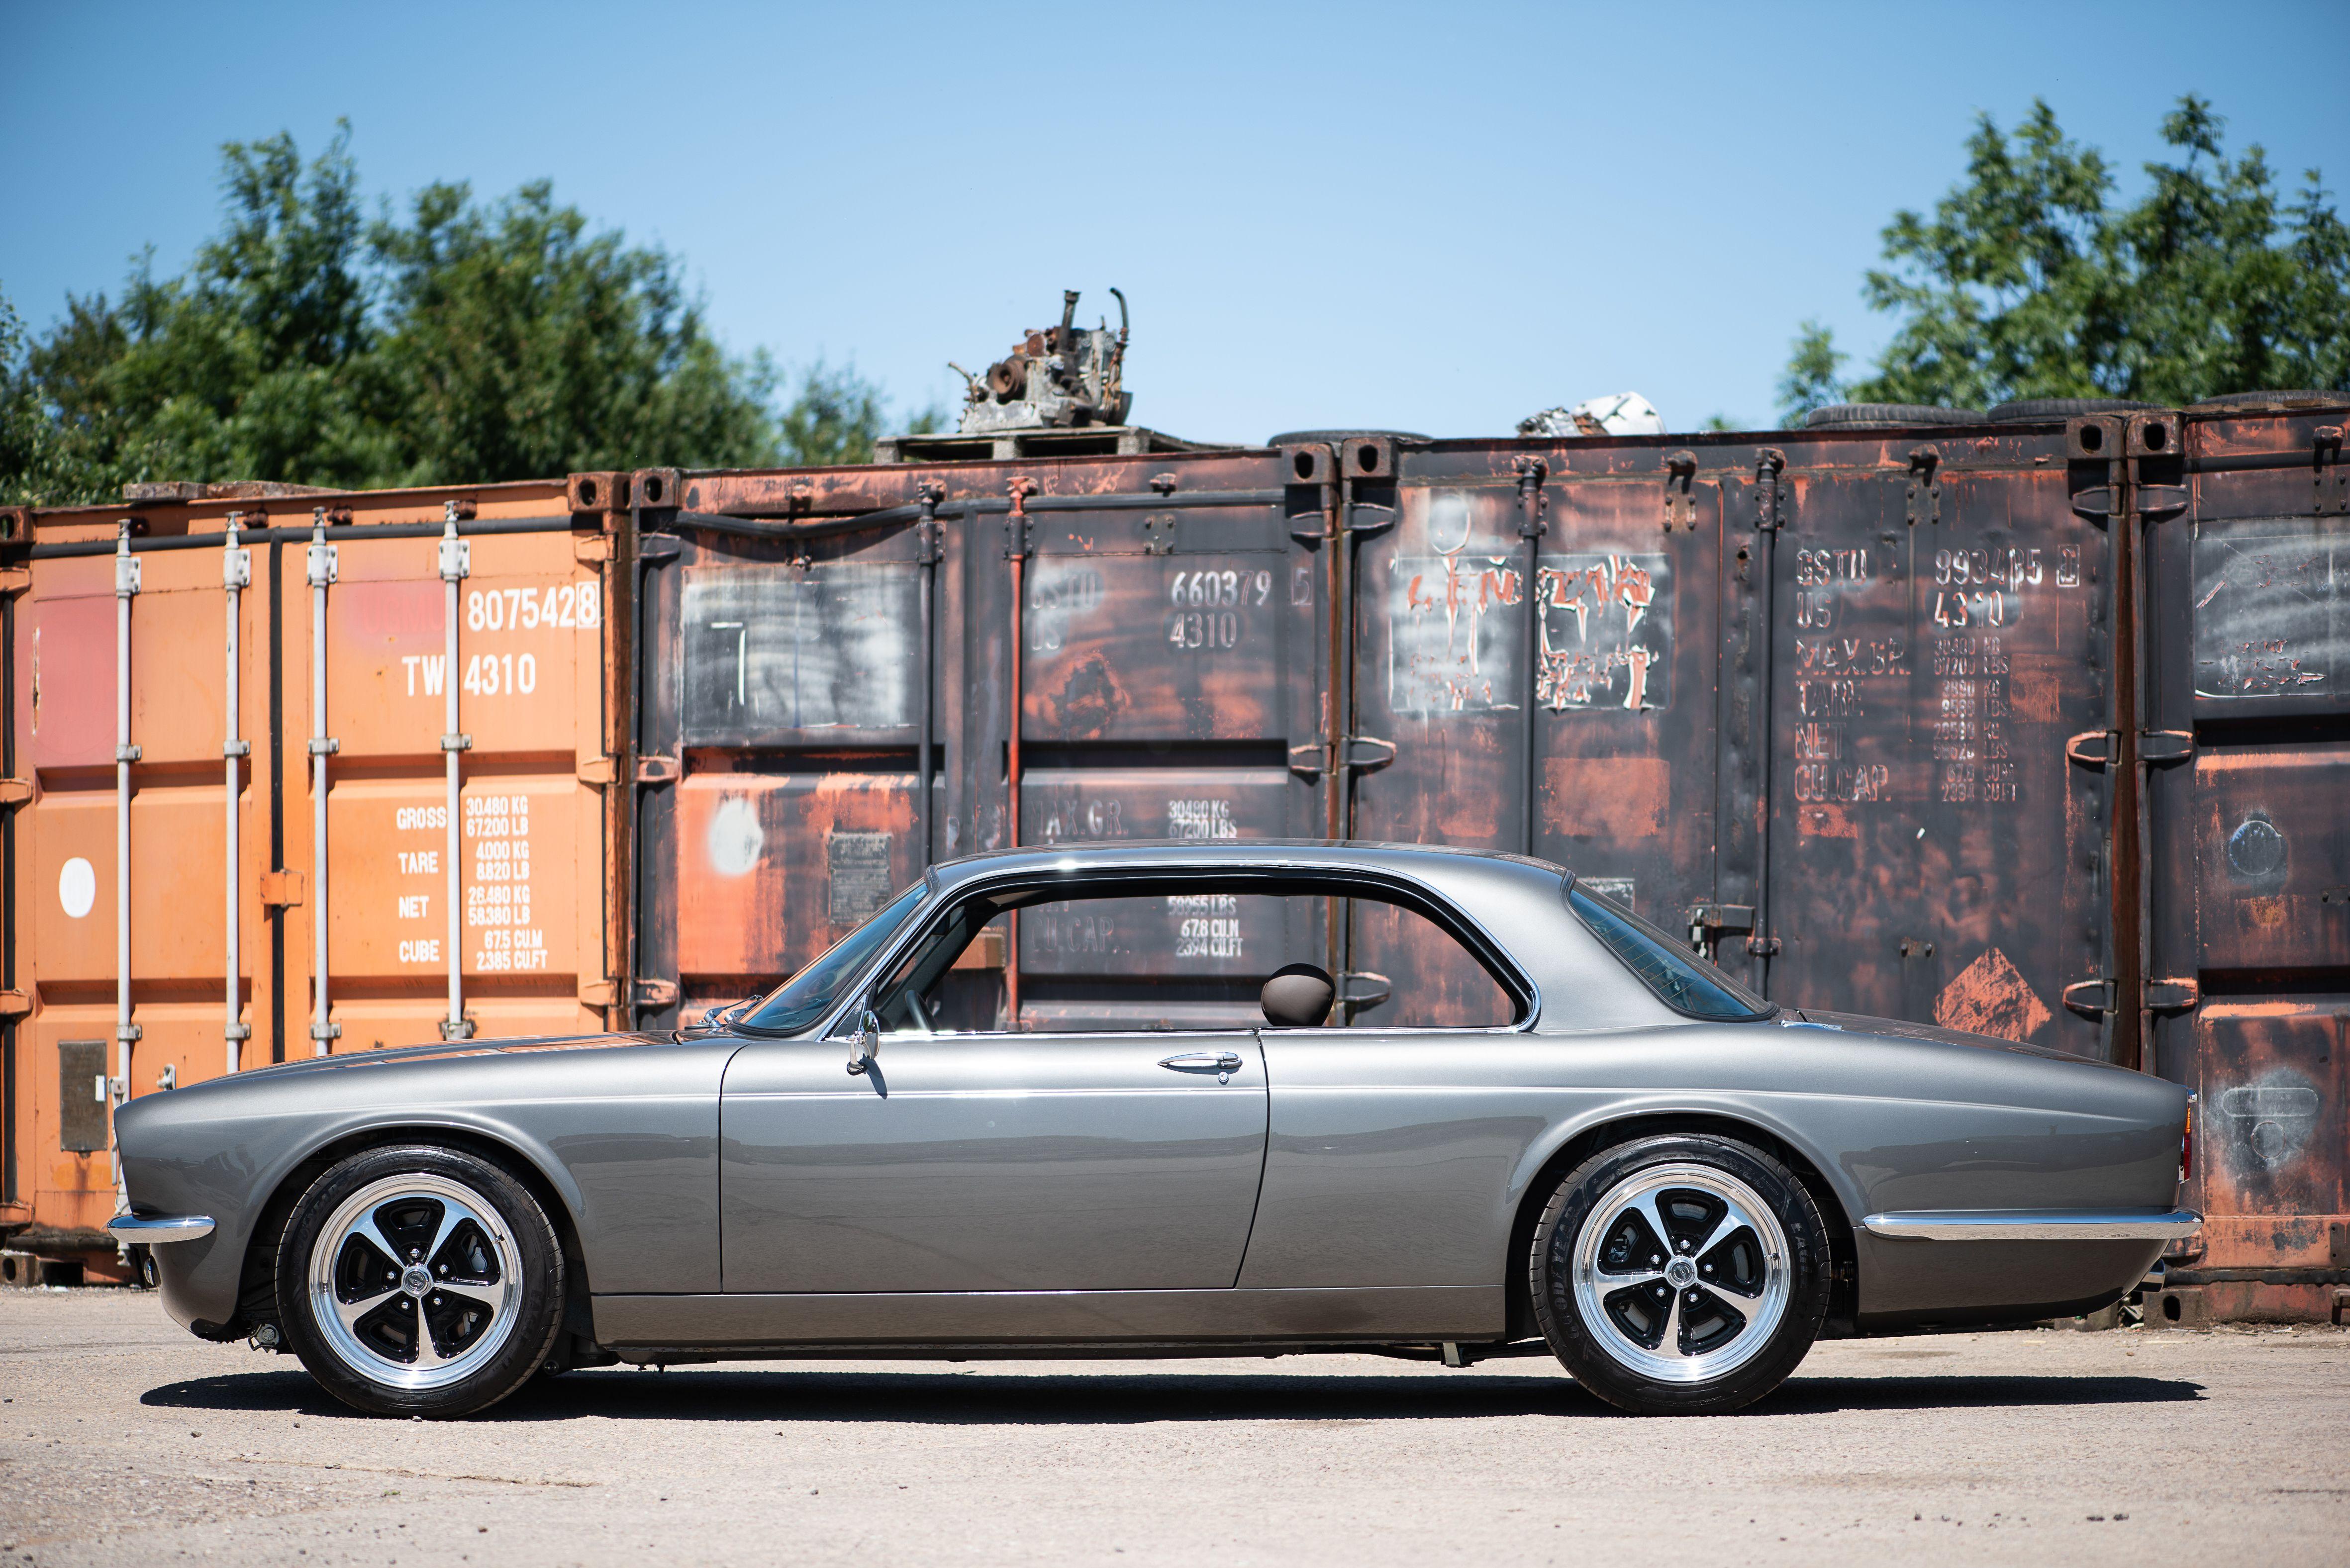 Jaguar Xjc Professionally Built Ls3 Powered Restomod Photo By